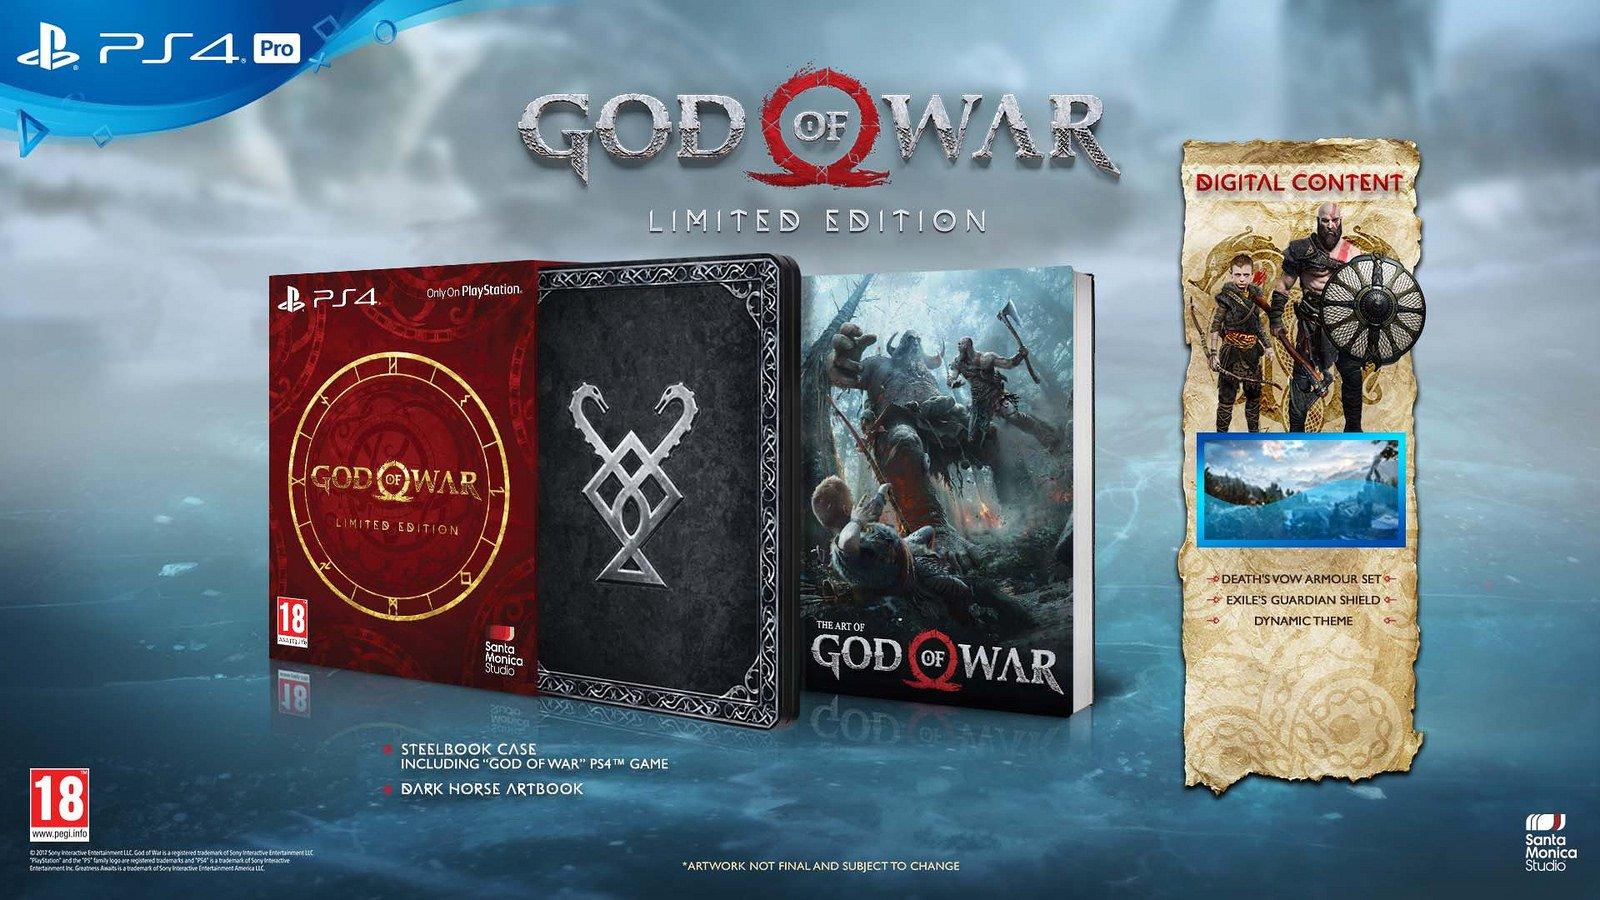 GodofWar PS4 Div 041